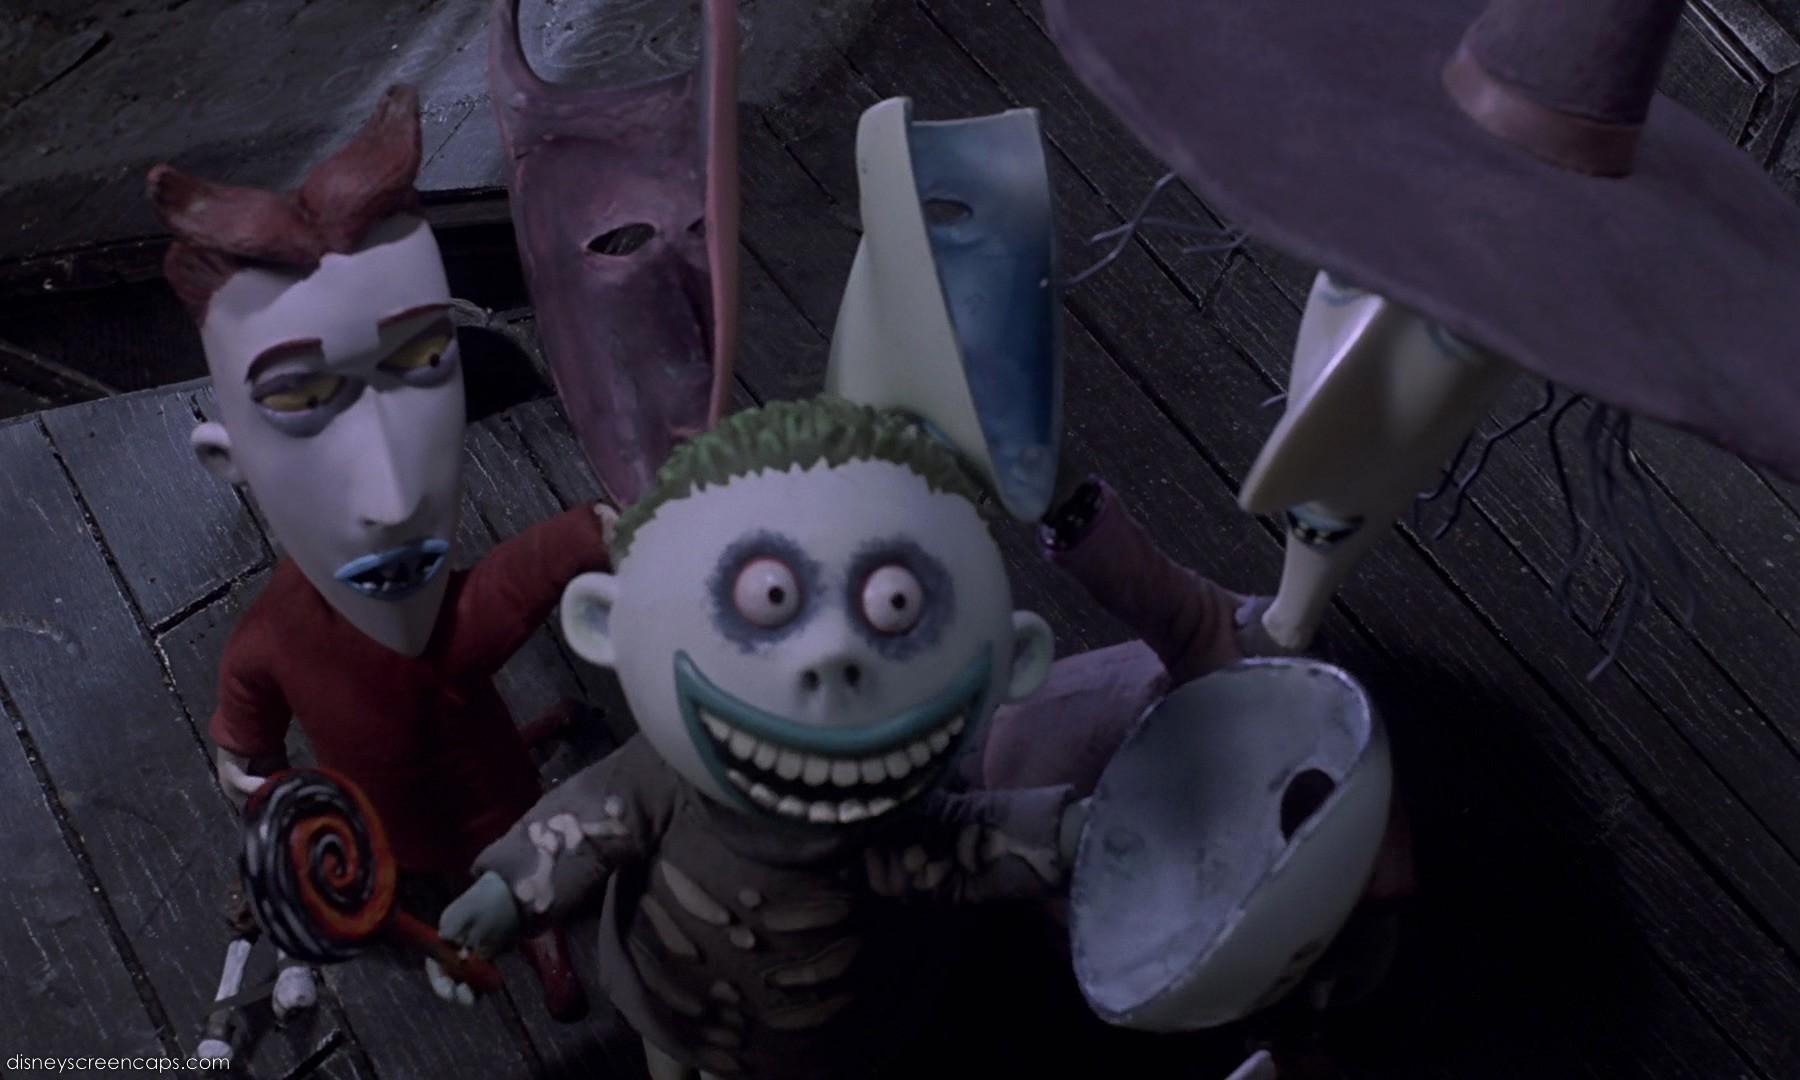 The Nightmare Before Christmas |Nightmare Before Christmas Characters Barrel